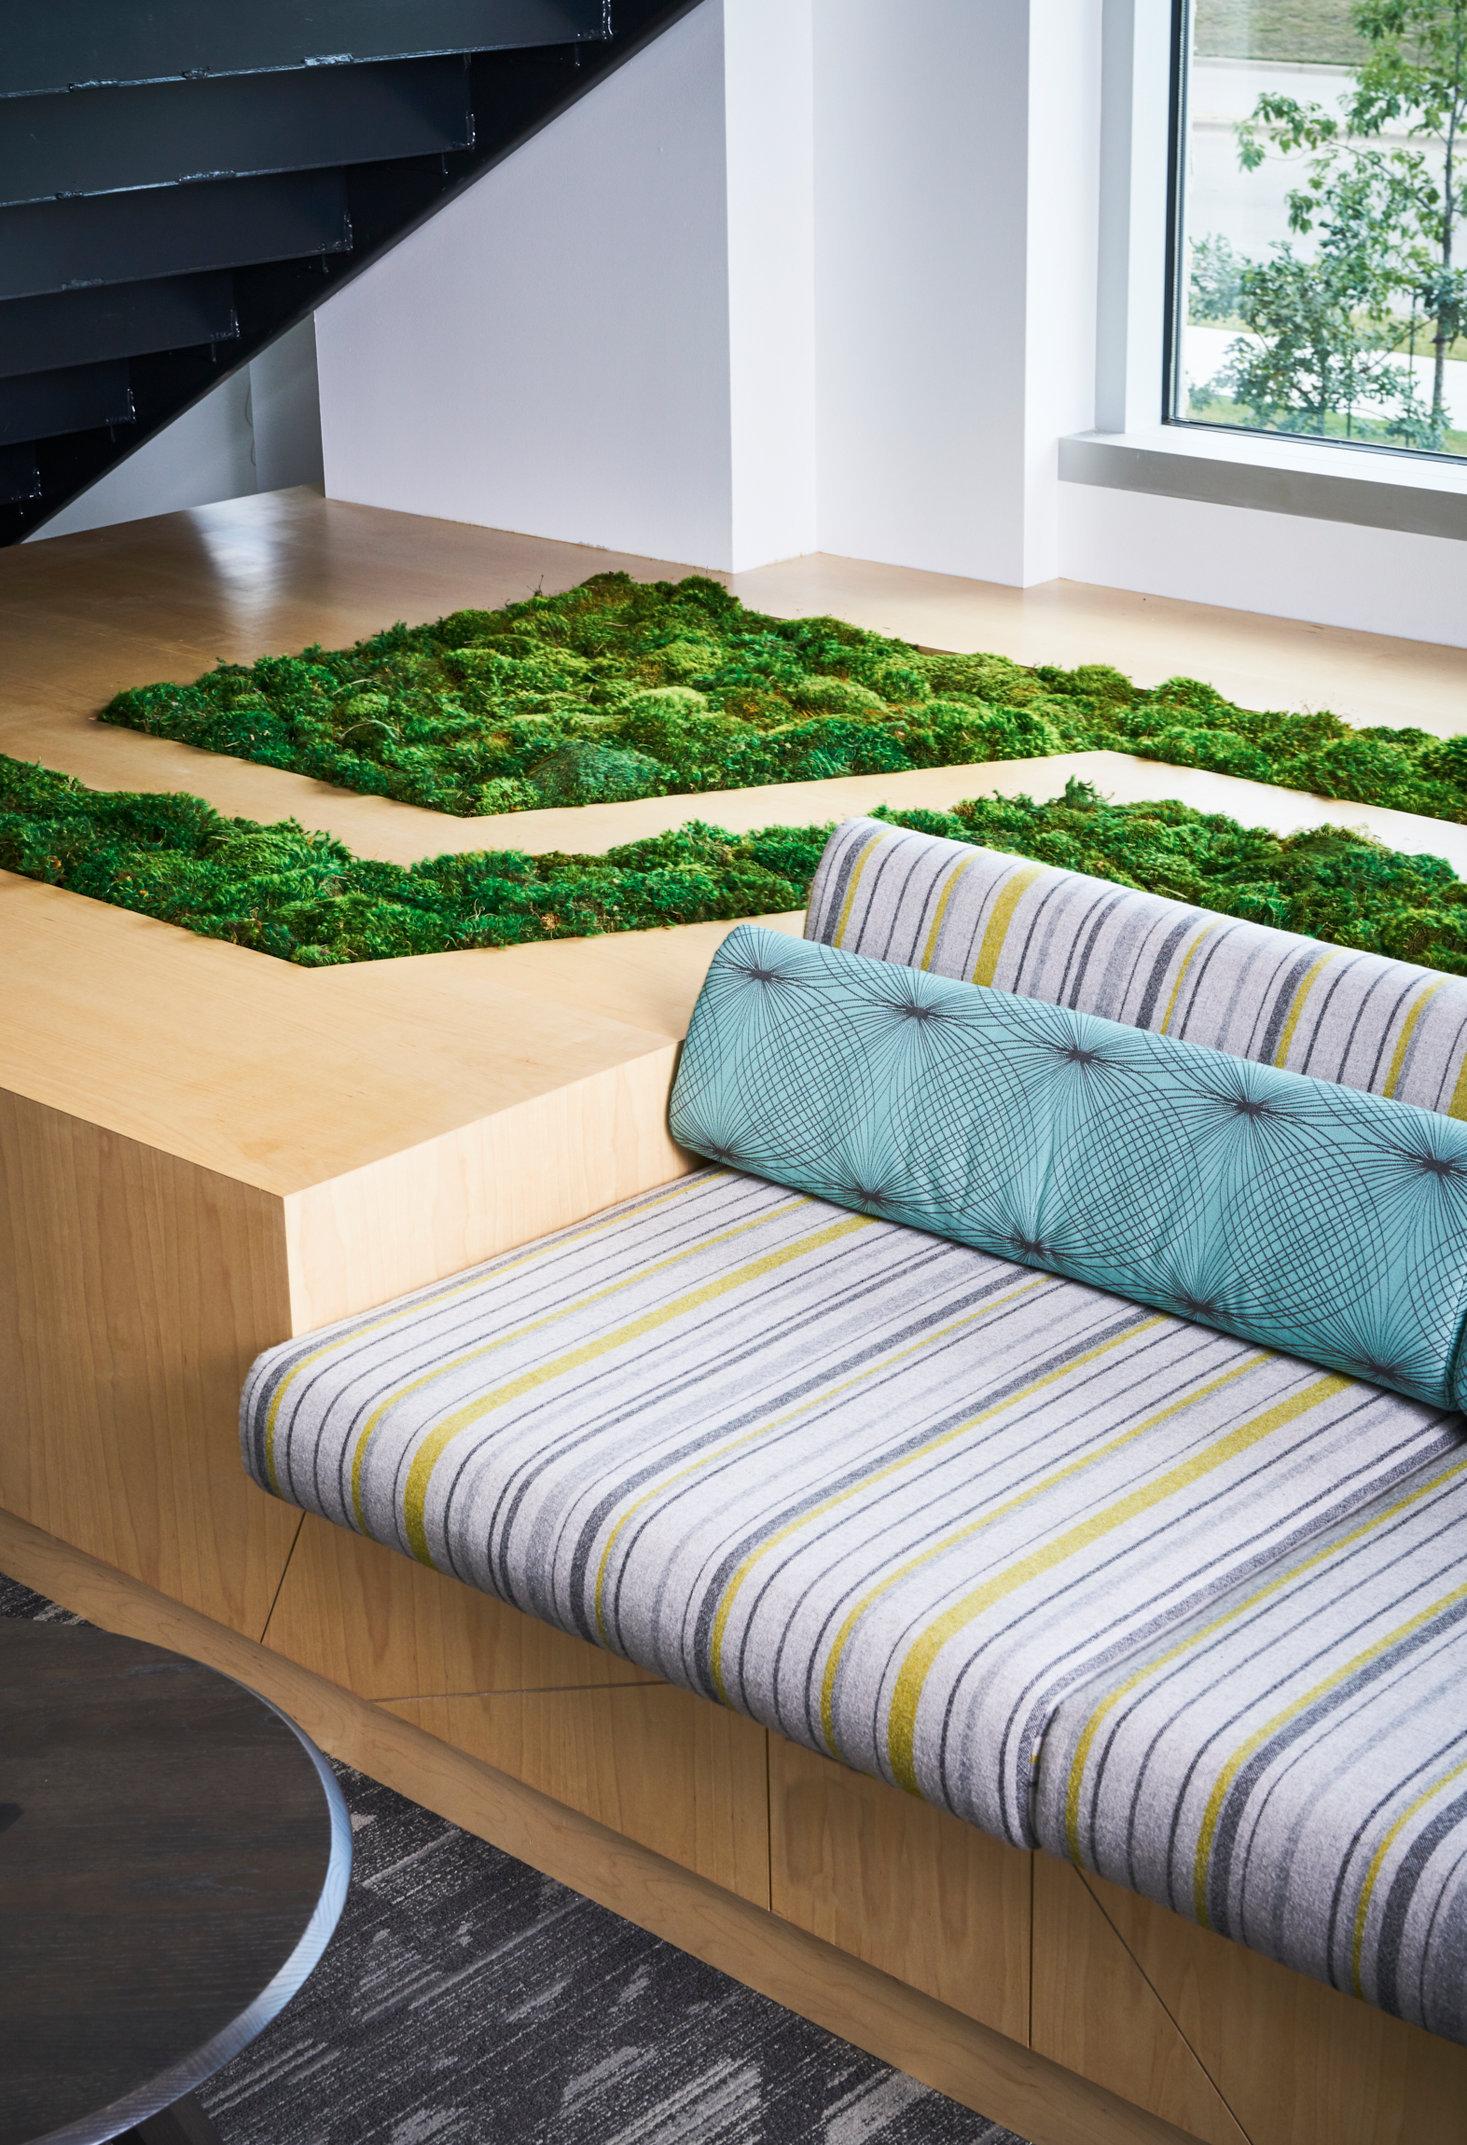 seatgrassdetail.jpg